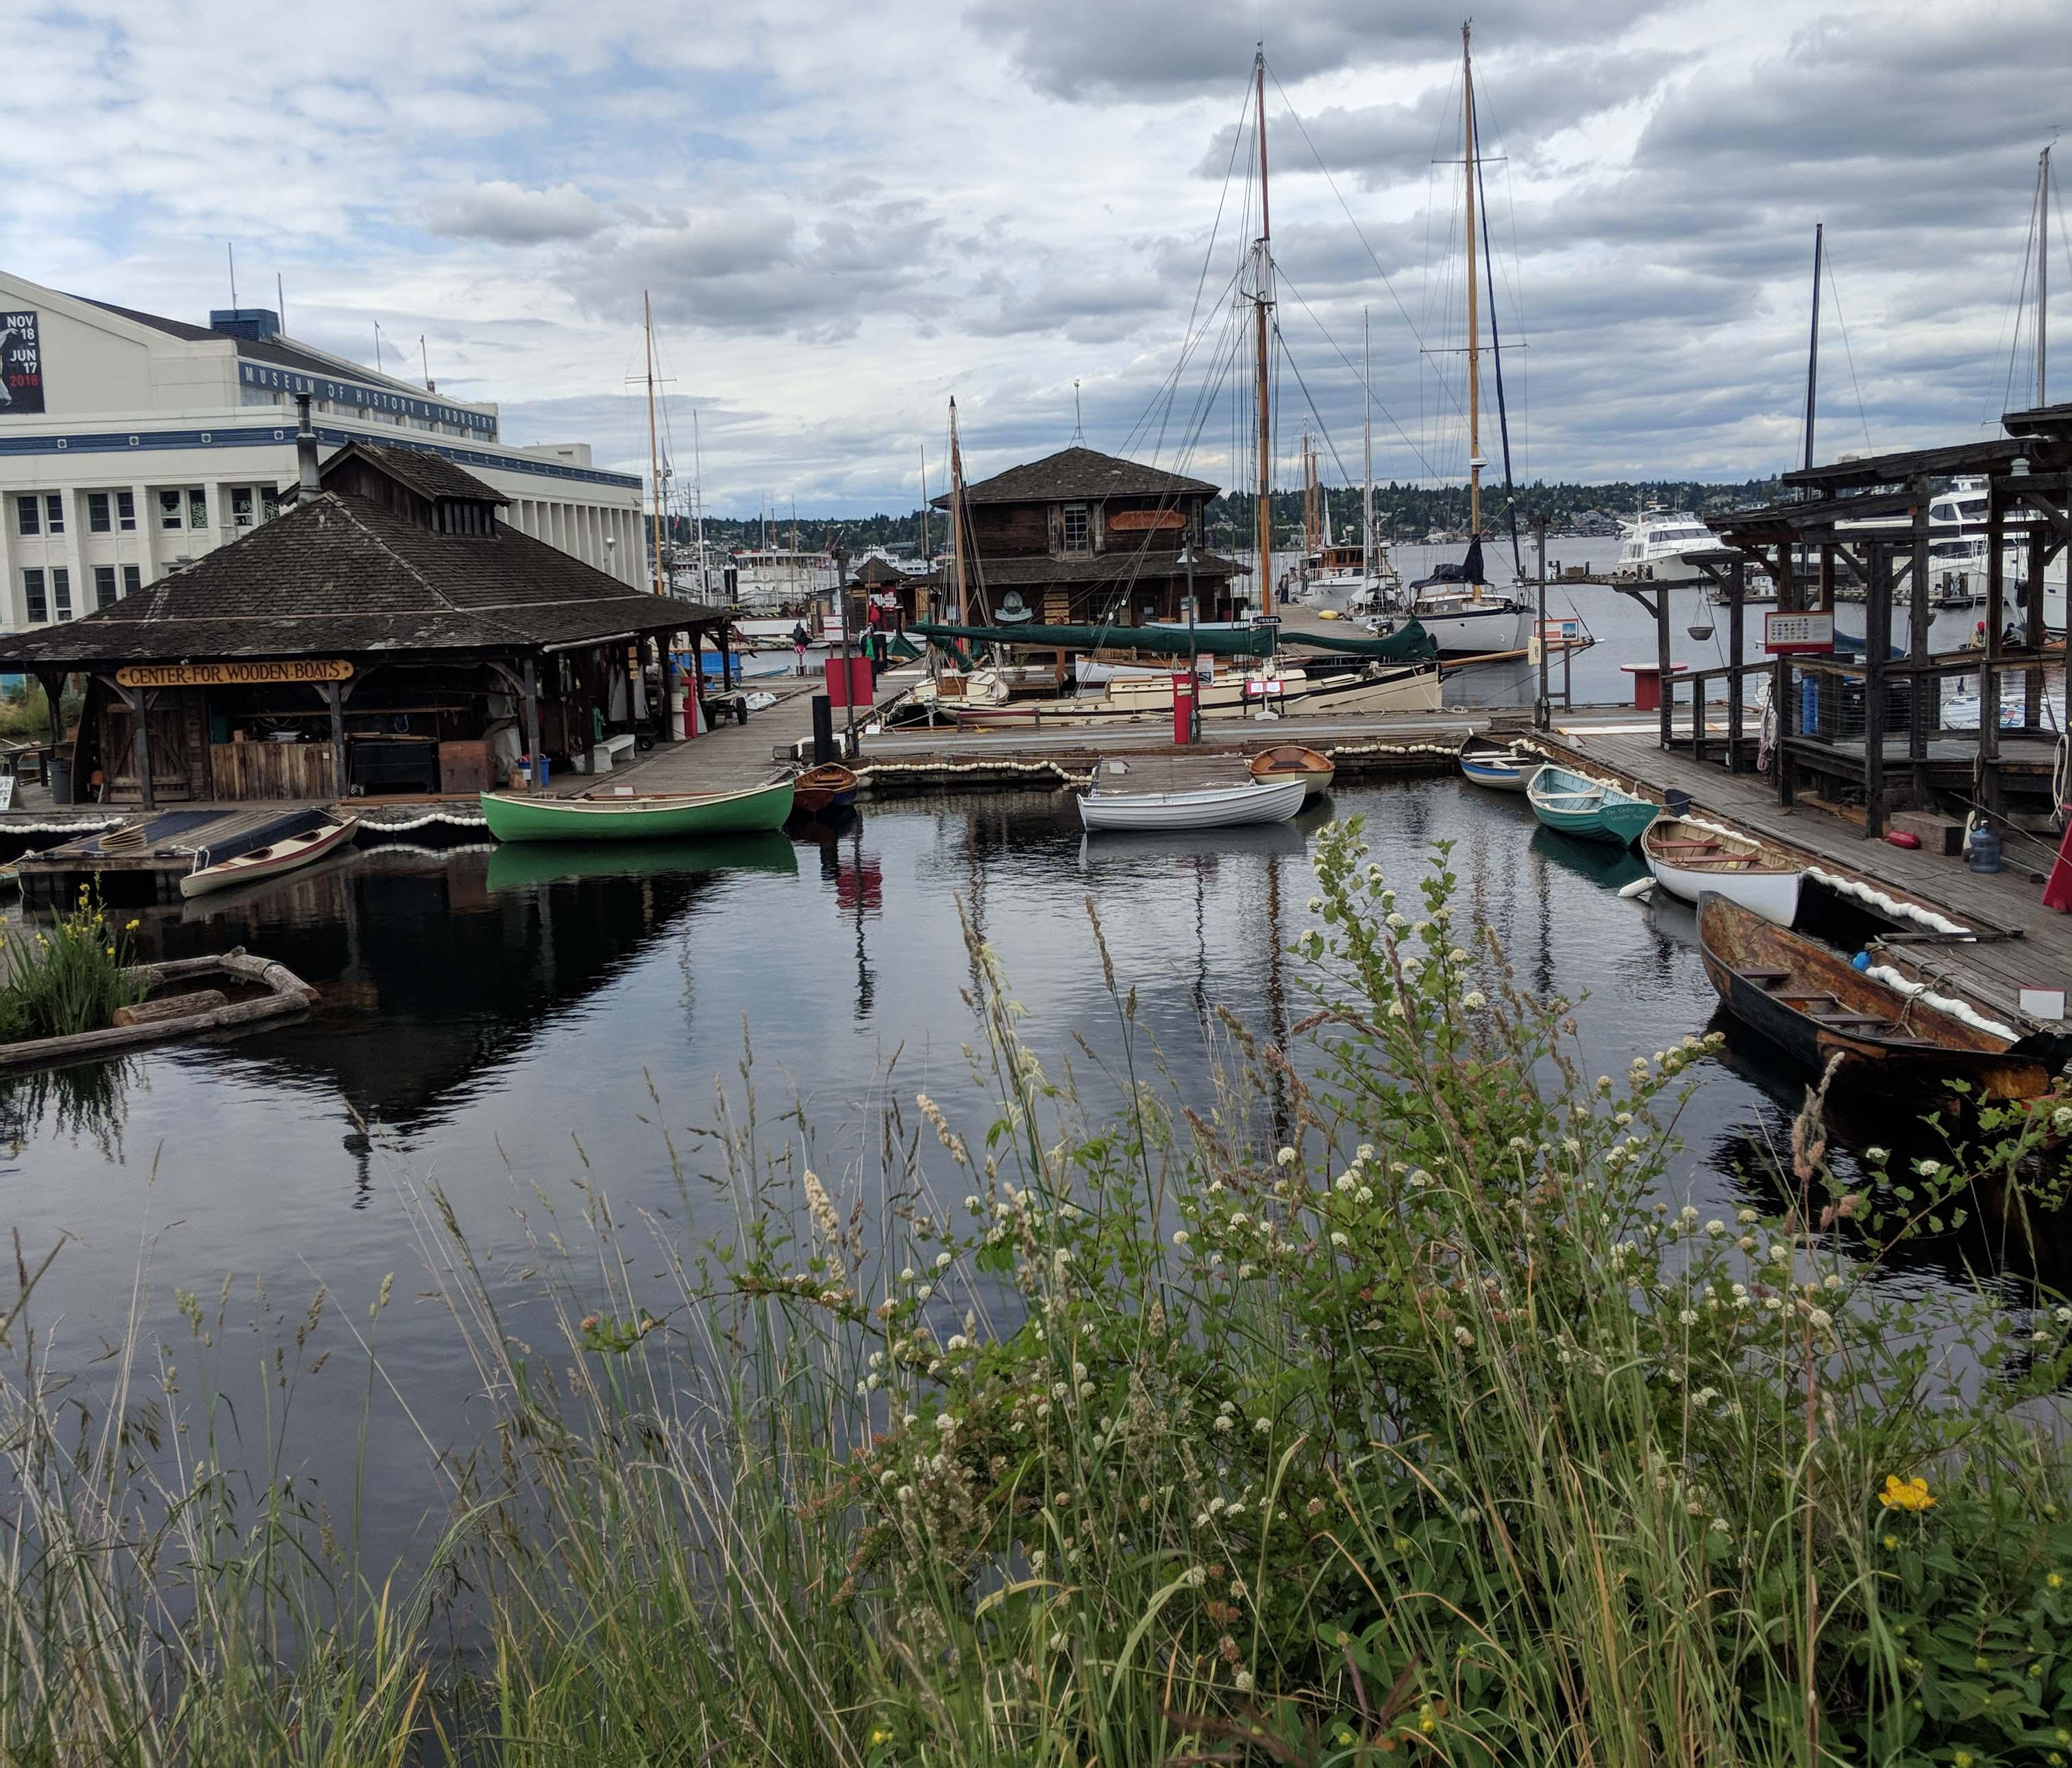 SLU's Center for Wooden Boats